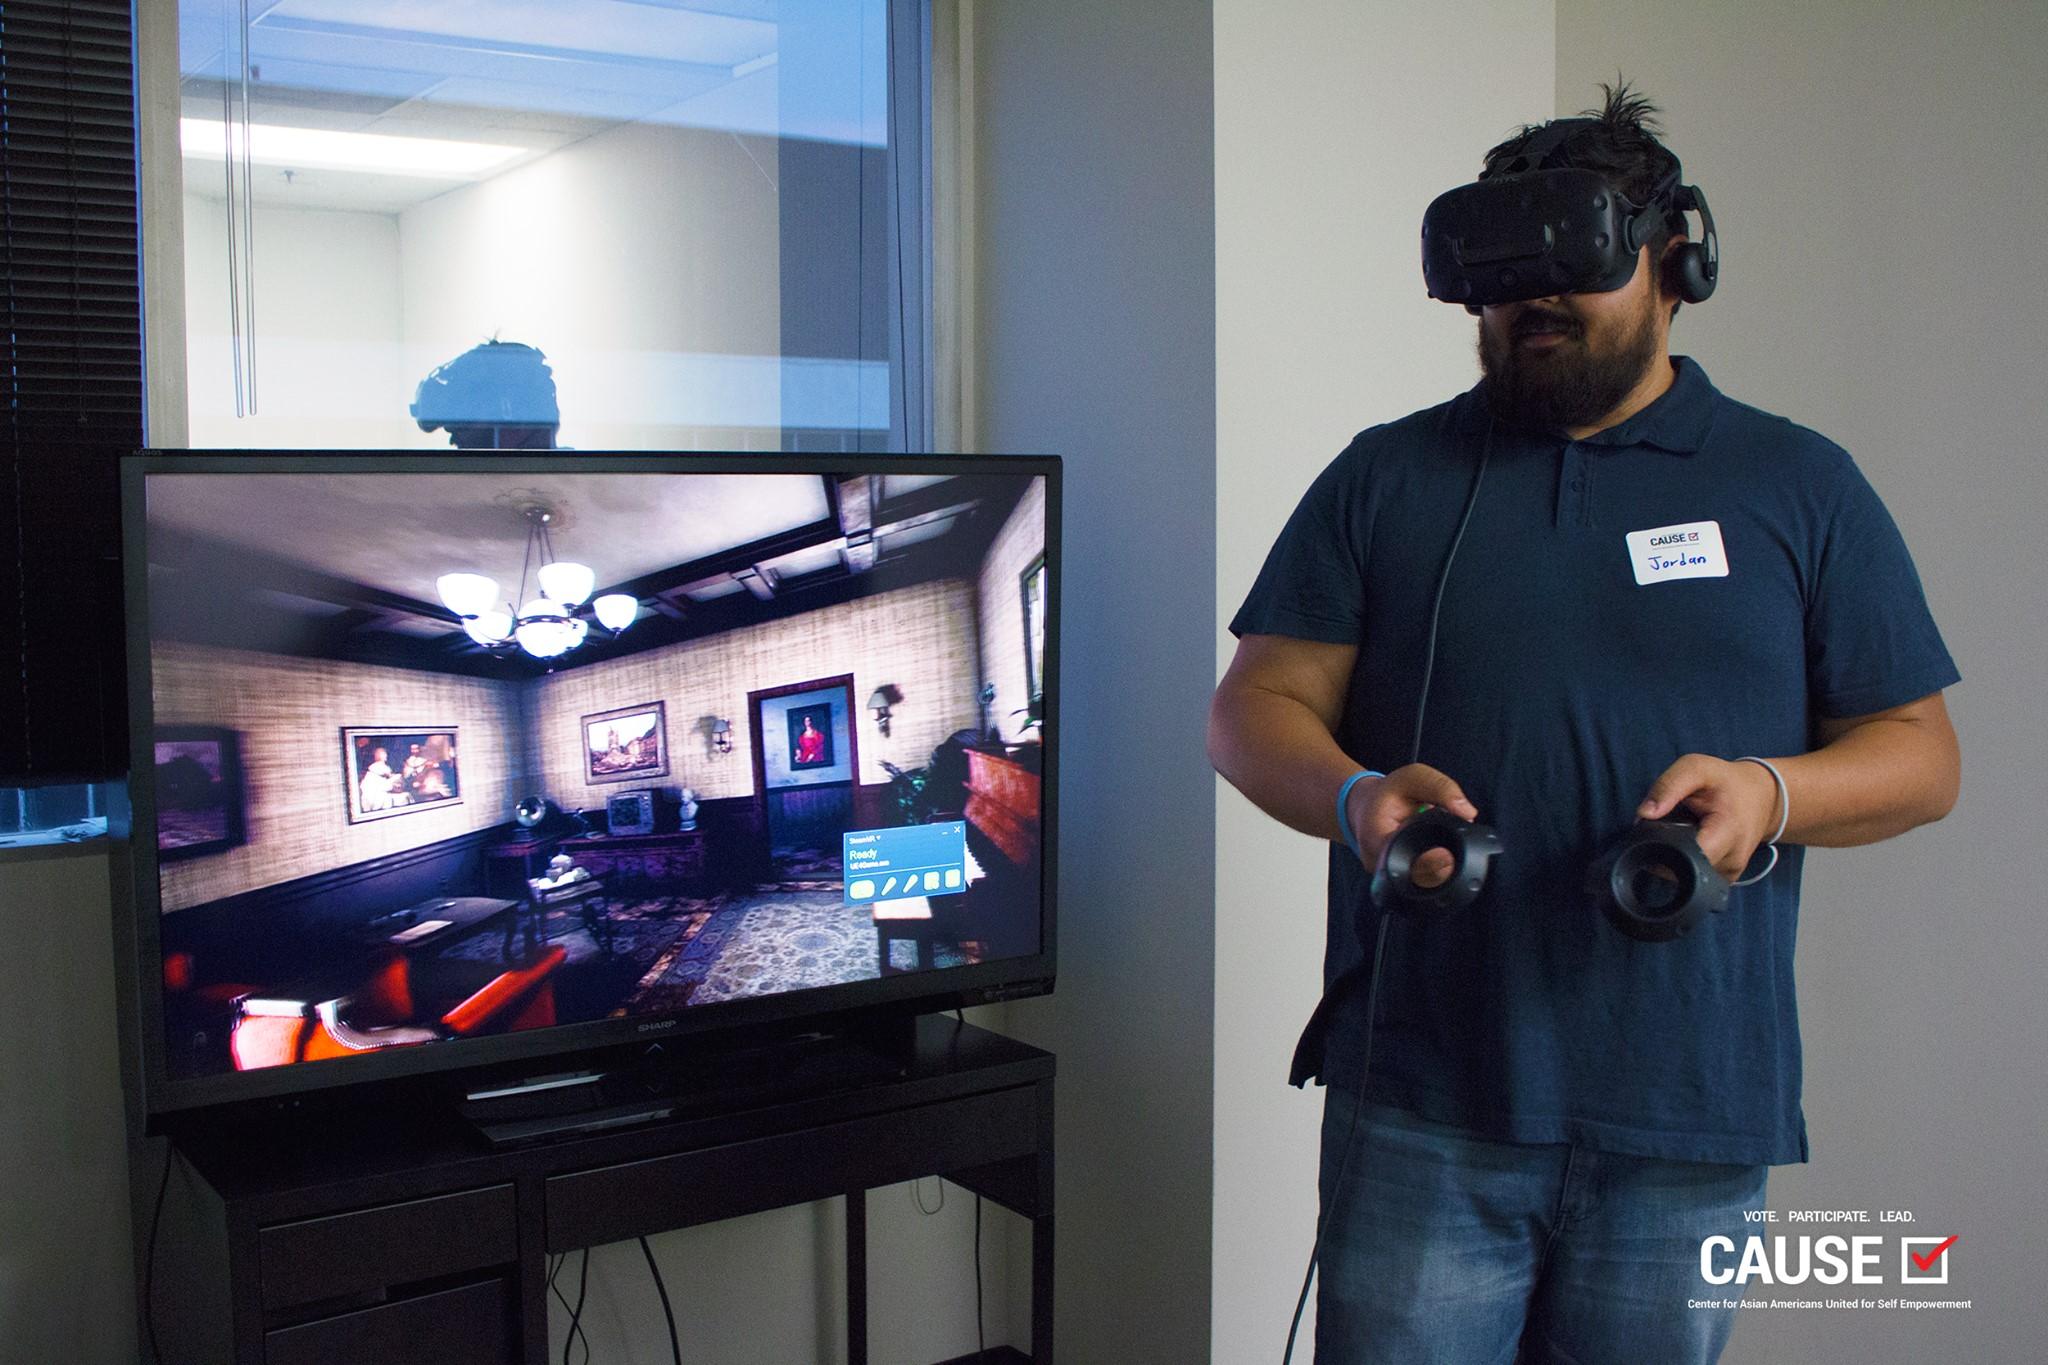 Demo of Pixel Canvas Studios VR game, Reiko's Fragments